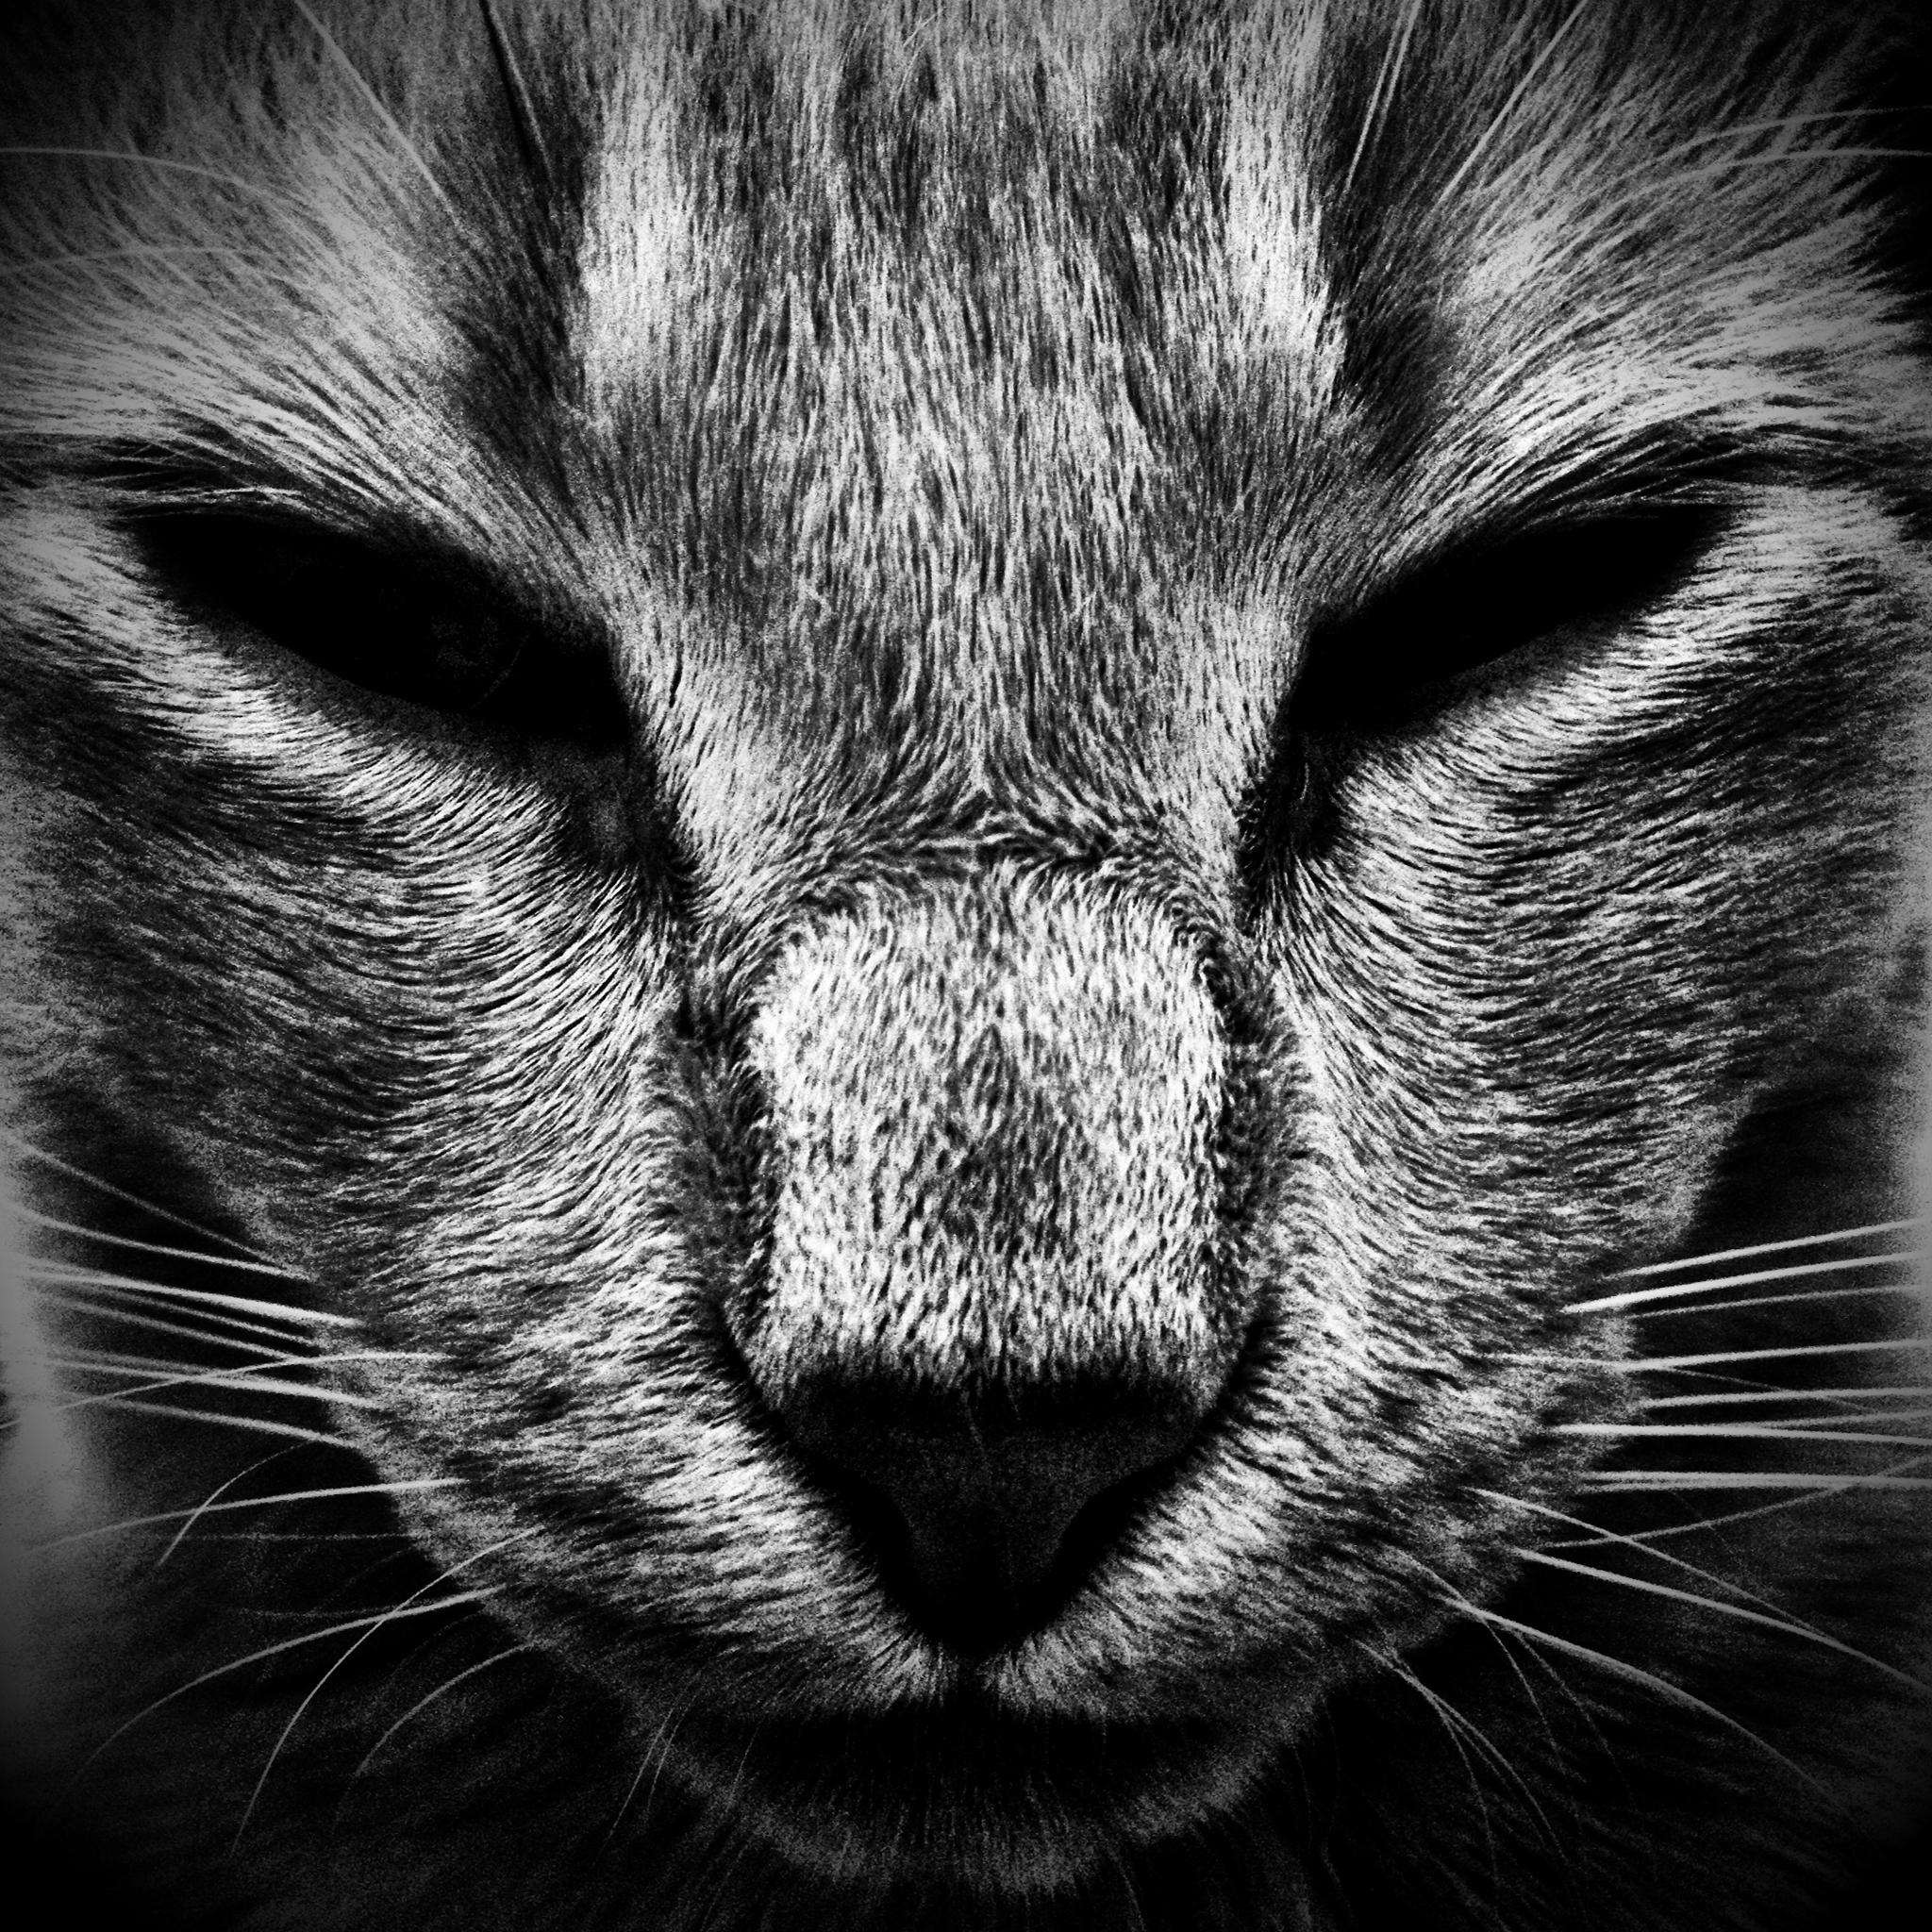 Black Cat 3Wallpapers ipad Retina Black Cat   iPad Retina